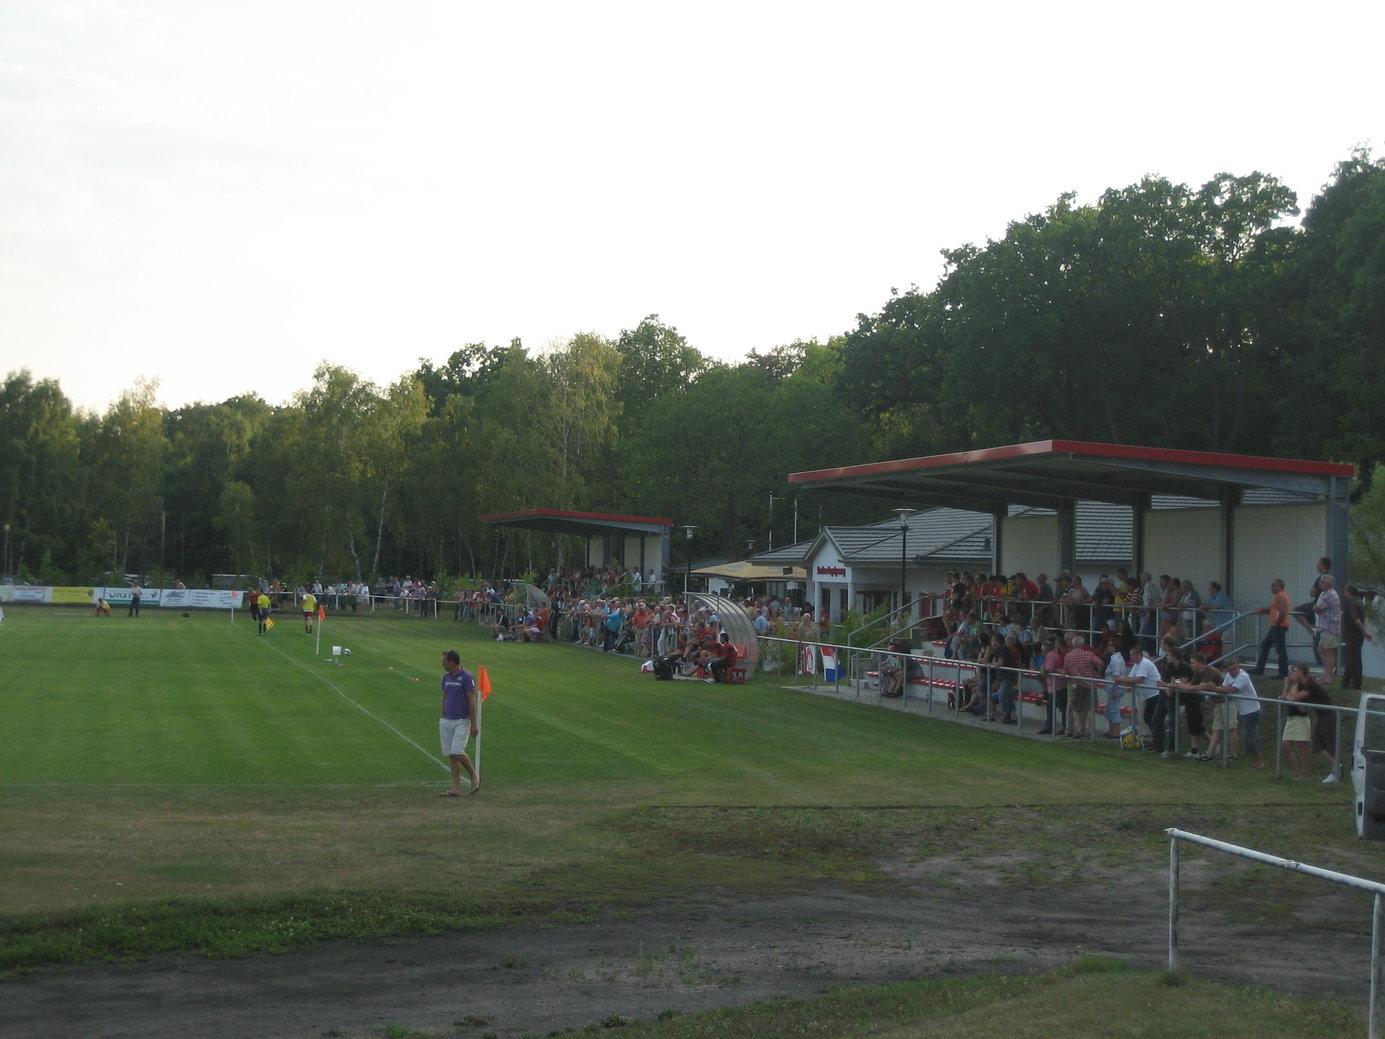 Stadion Vogelgesang